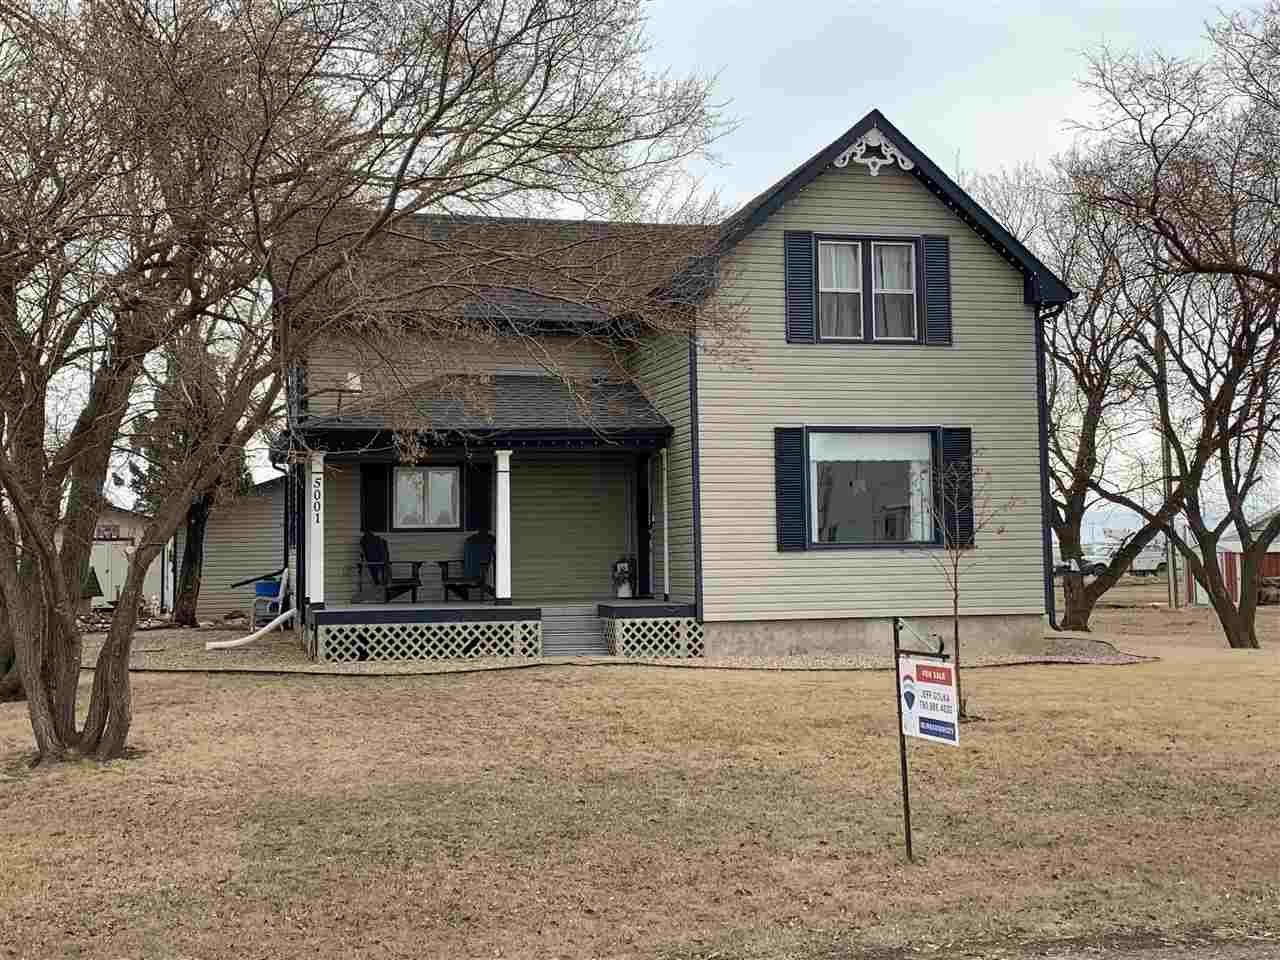 Main Photo: 5001 51 Street: Strome House for sale : MLS®# E4233634